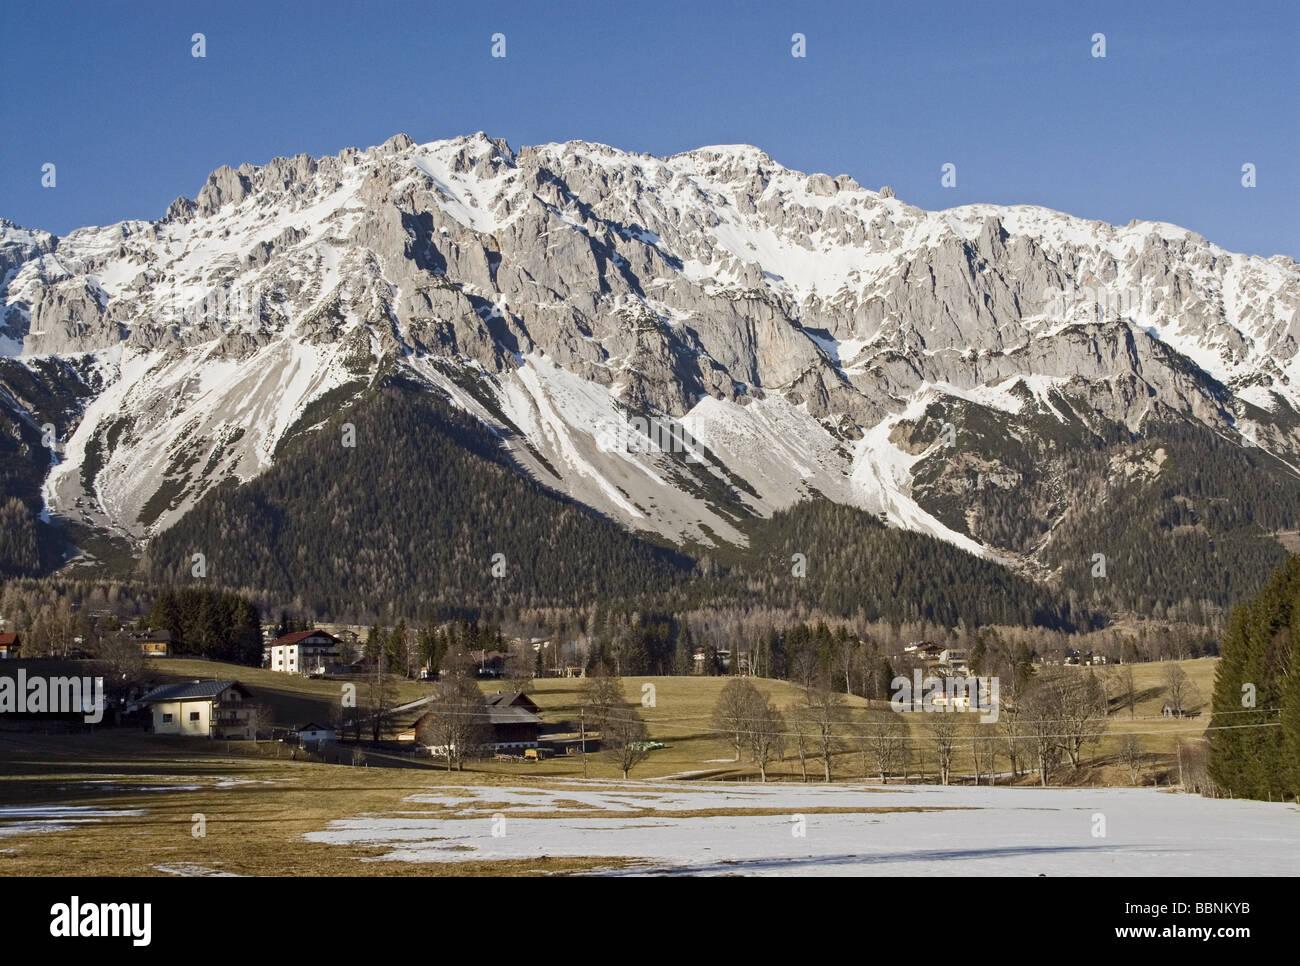 Geografia / viaggi, Austria, la Stiria, paesaggi, Ramsau am Dachstein Additional-Rights-Clearance-Info-Not-Available Immagini Stock